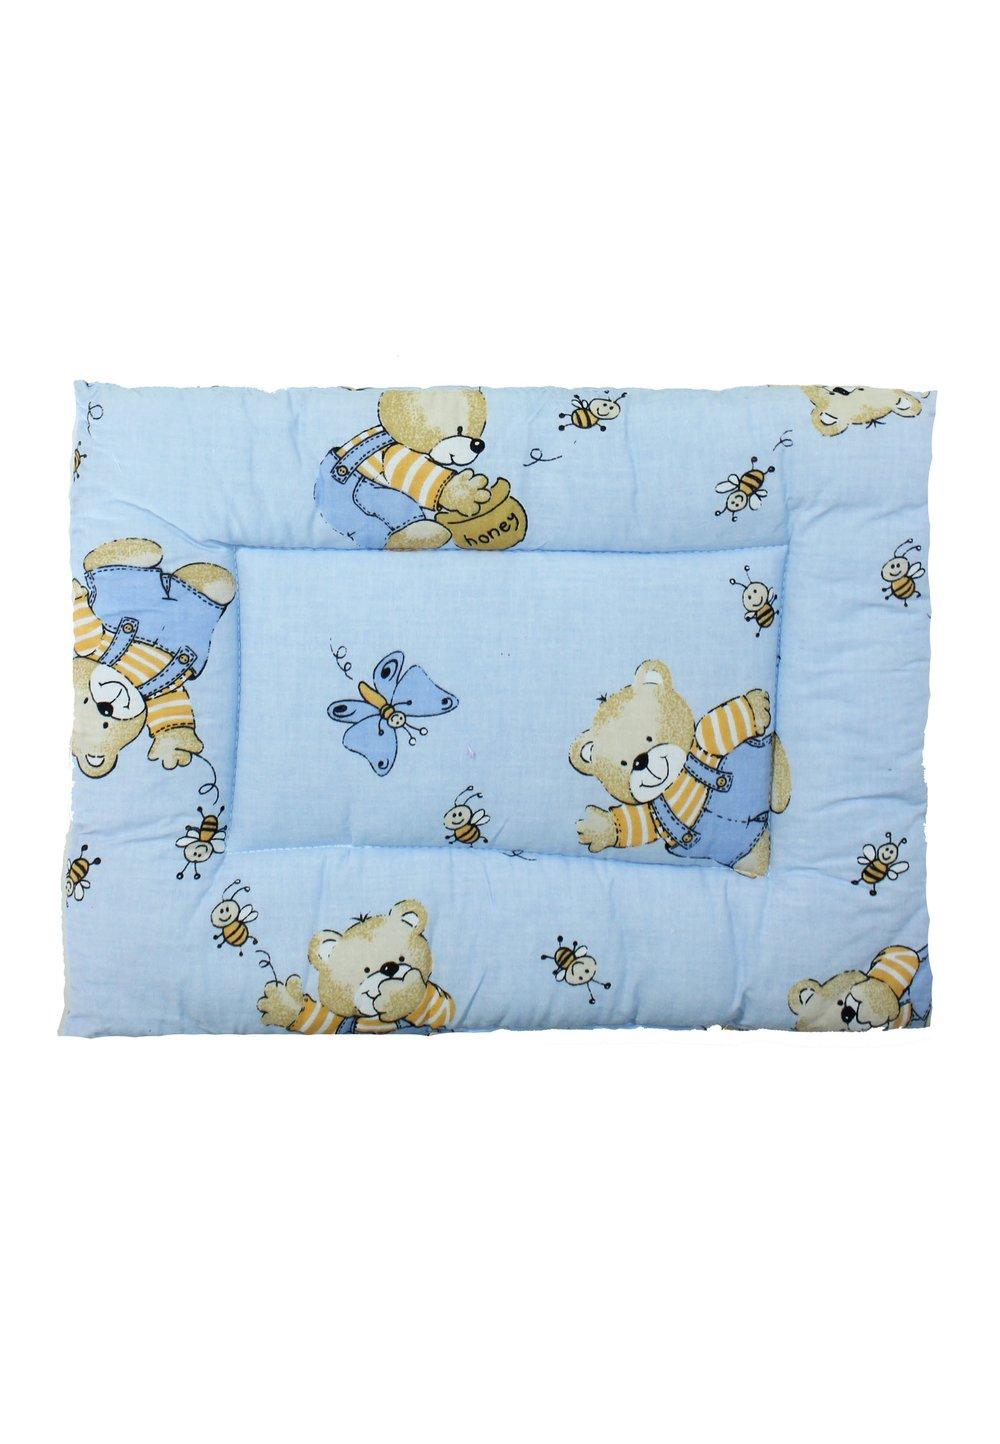 Perna slim, Ursuleti cu albinute, albastru, 37x28cm imagine